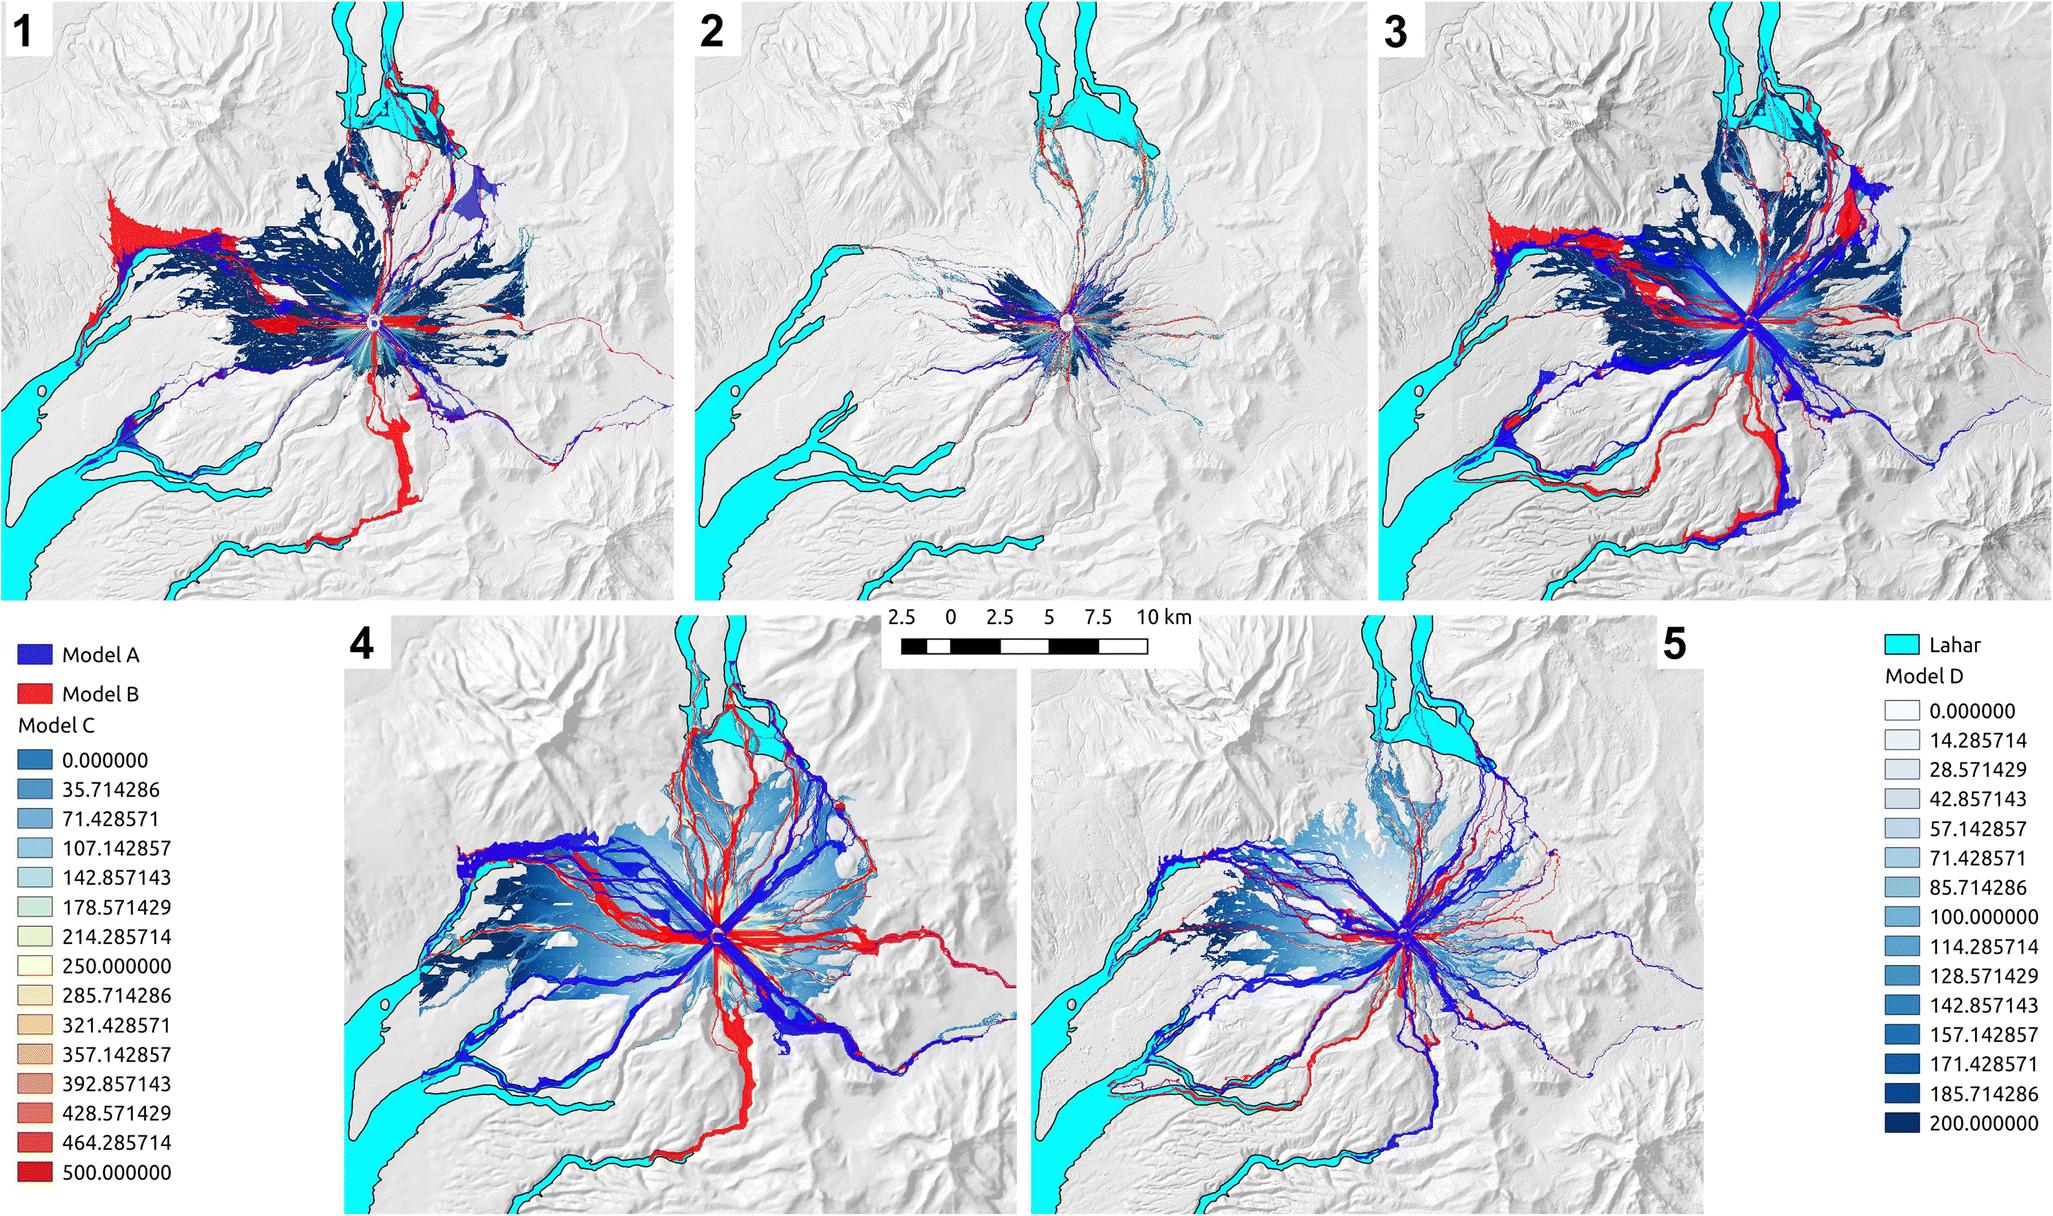 MDTanaliza: understanding digital elevation models when facing